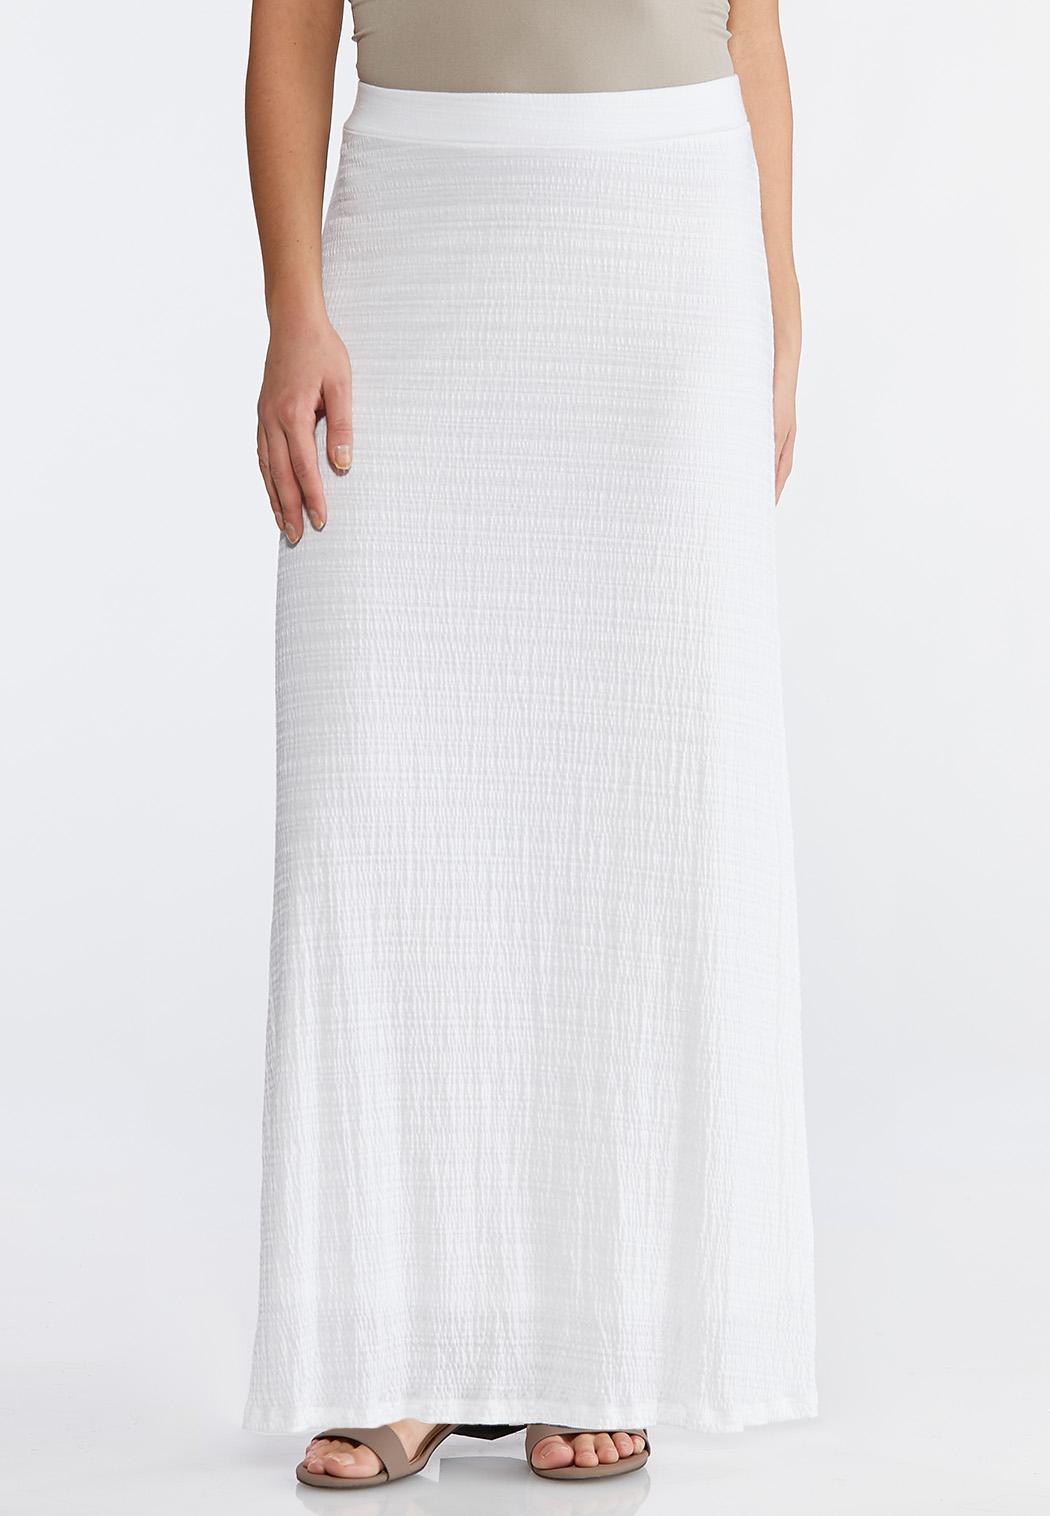 e919be5ea Plus Size Slub Knit Maxi Skirt Maxi Cato Fashions